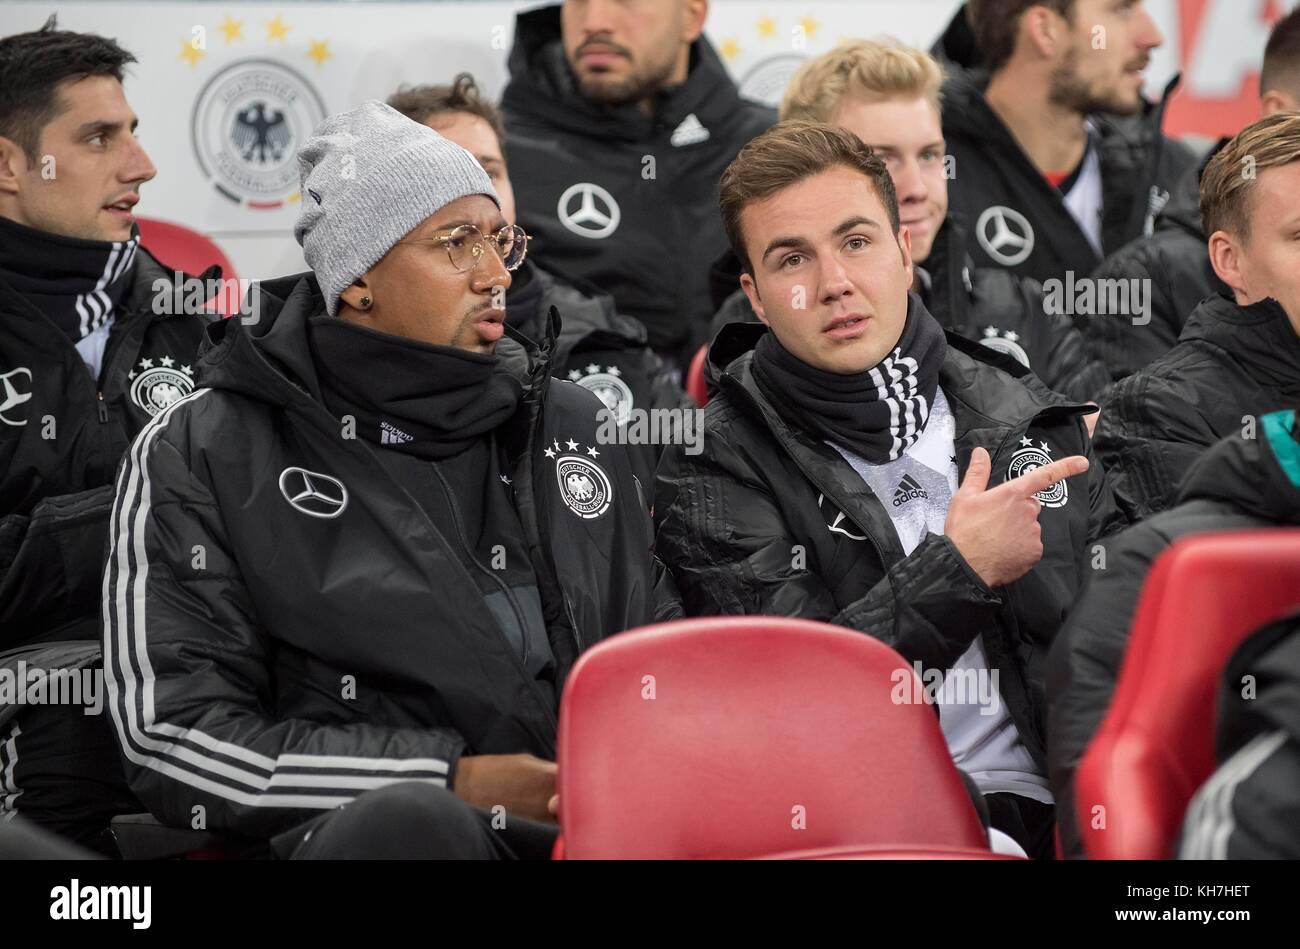 left to right Jerome BOATENG (GER), Mario GOETZE (Gotze, GER) sitzen auf der Ersatzbank Fussball Laenderspiel, Freundschaftsspiel, - Stock Image